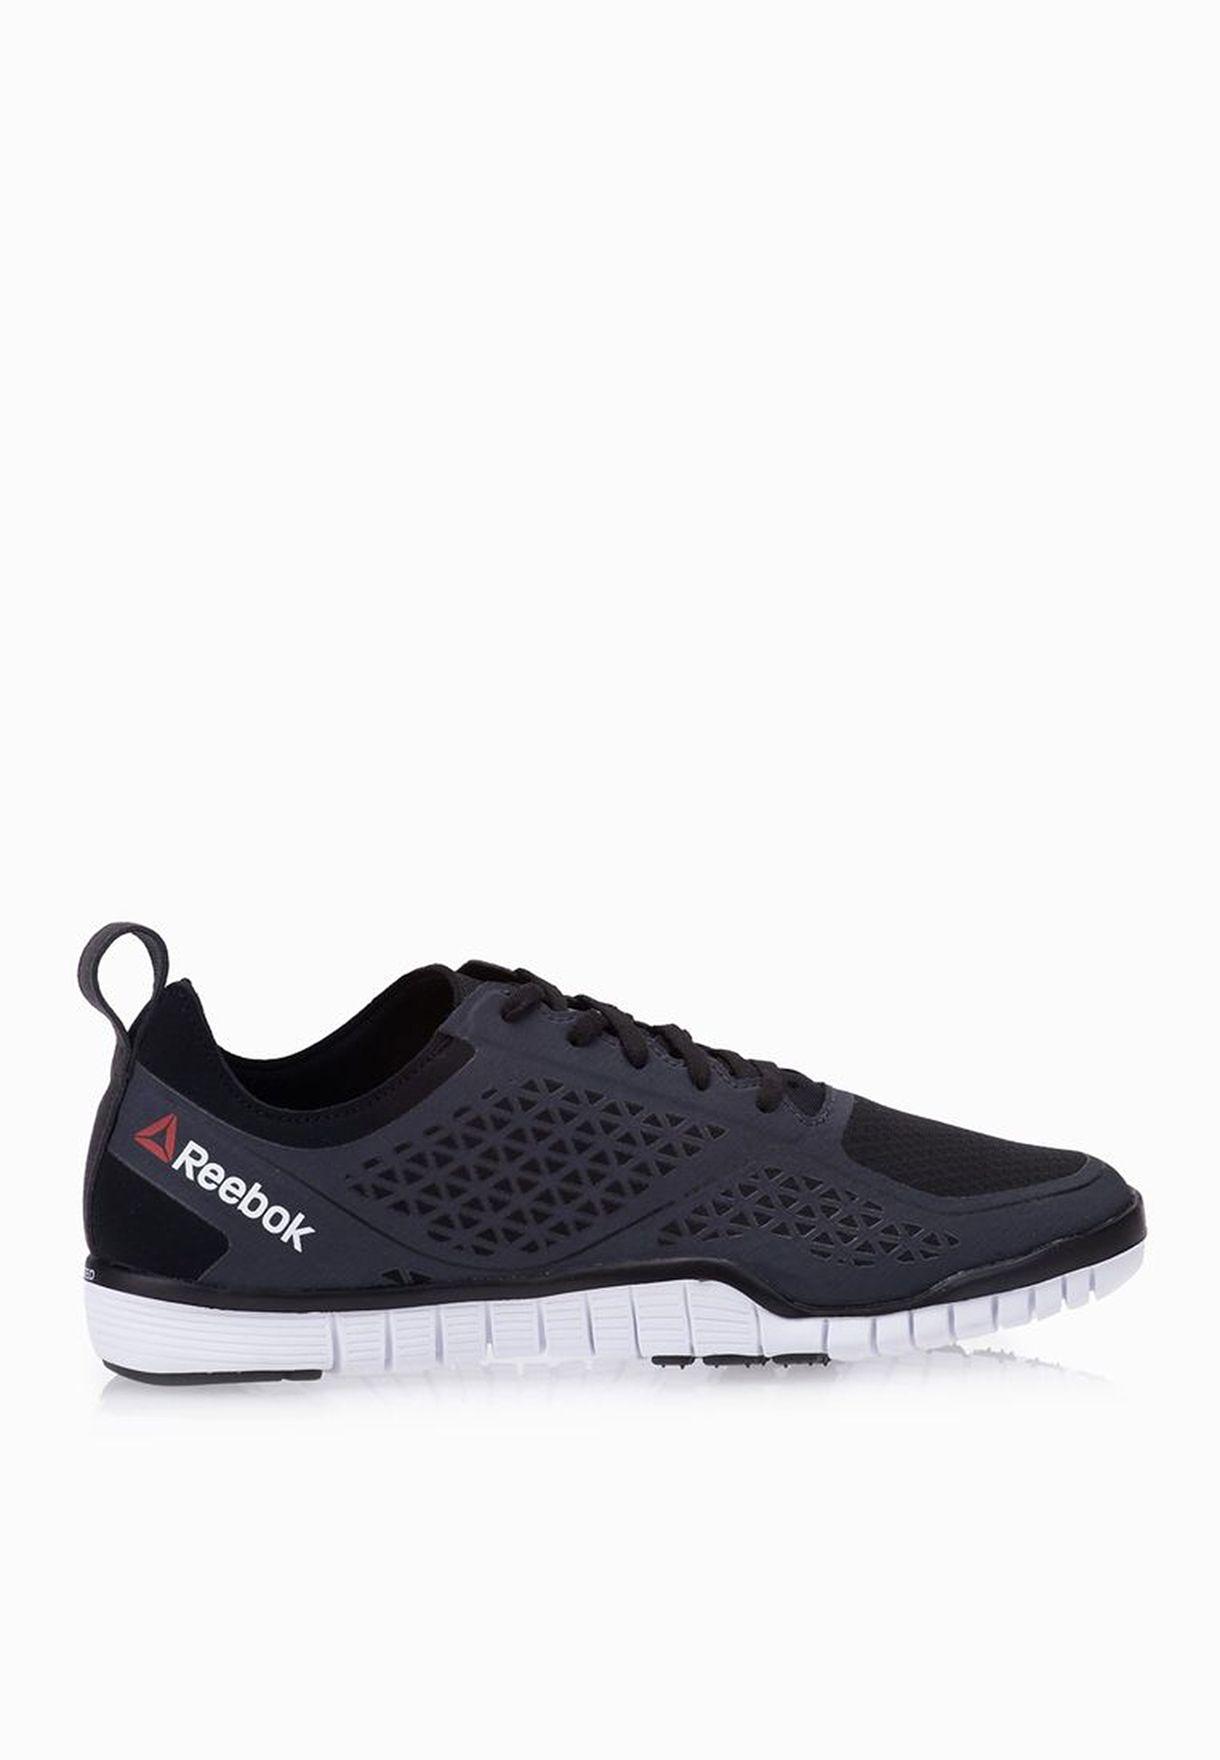 f144c6c42cab8 تسوق حذاء رياضة Reebok ZQuick Lux ماركة ريبوك لون أسود M49456 في قطر ...